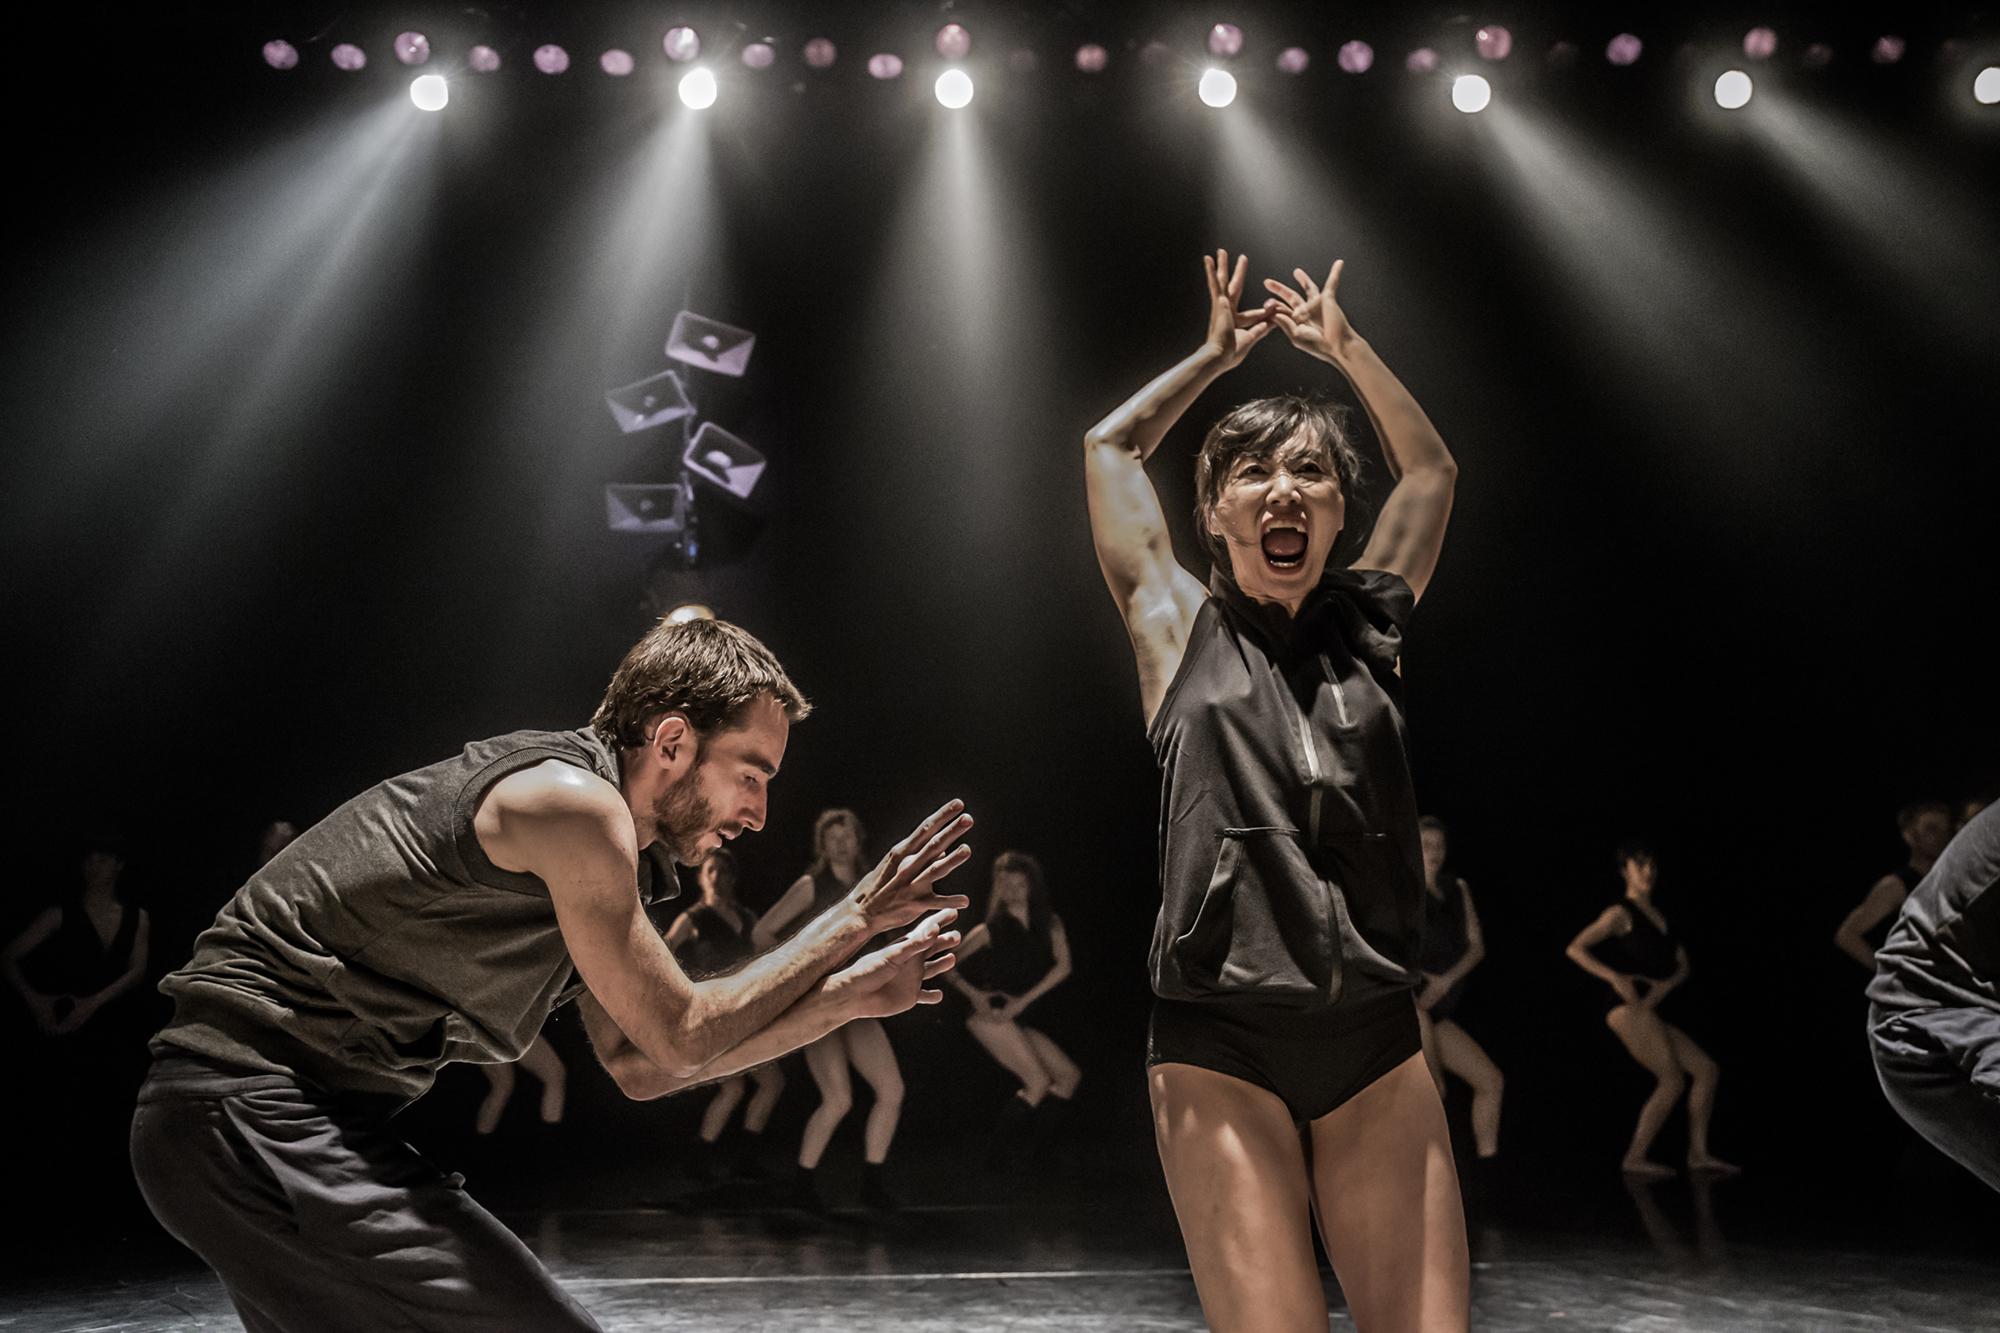 Kibbutz Contemporary Dance Company due to perform Asylum